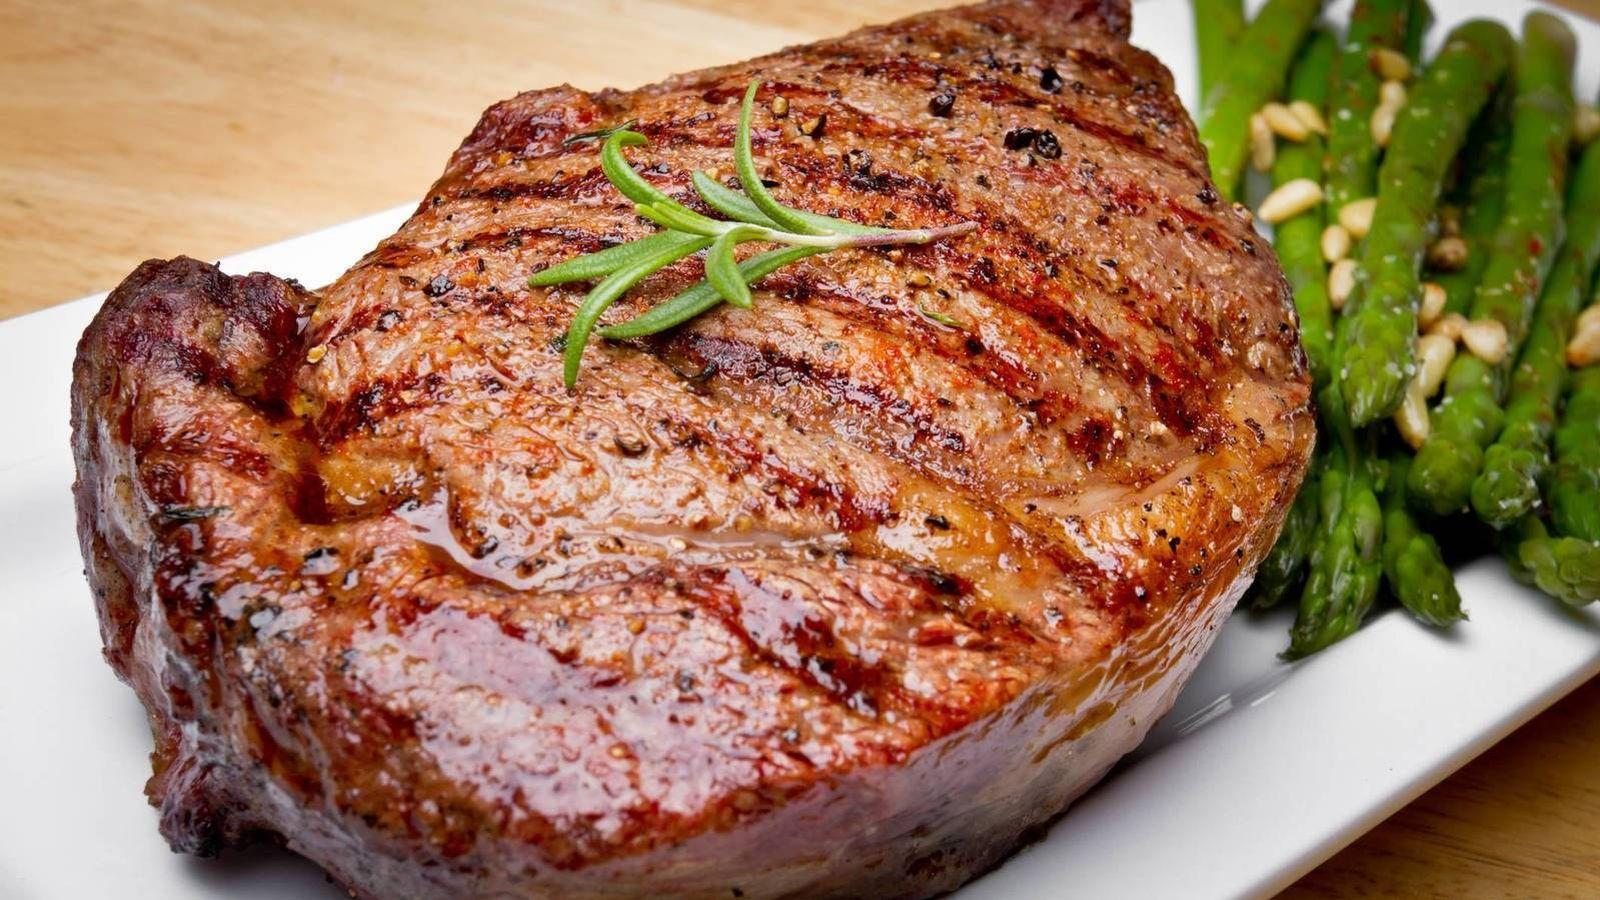 dieta cetogenica para adelgazar rapido